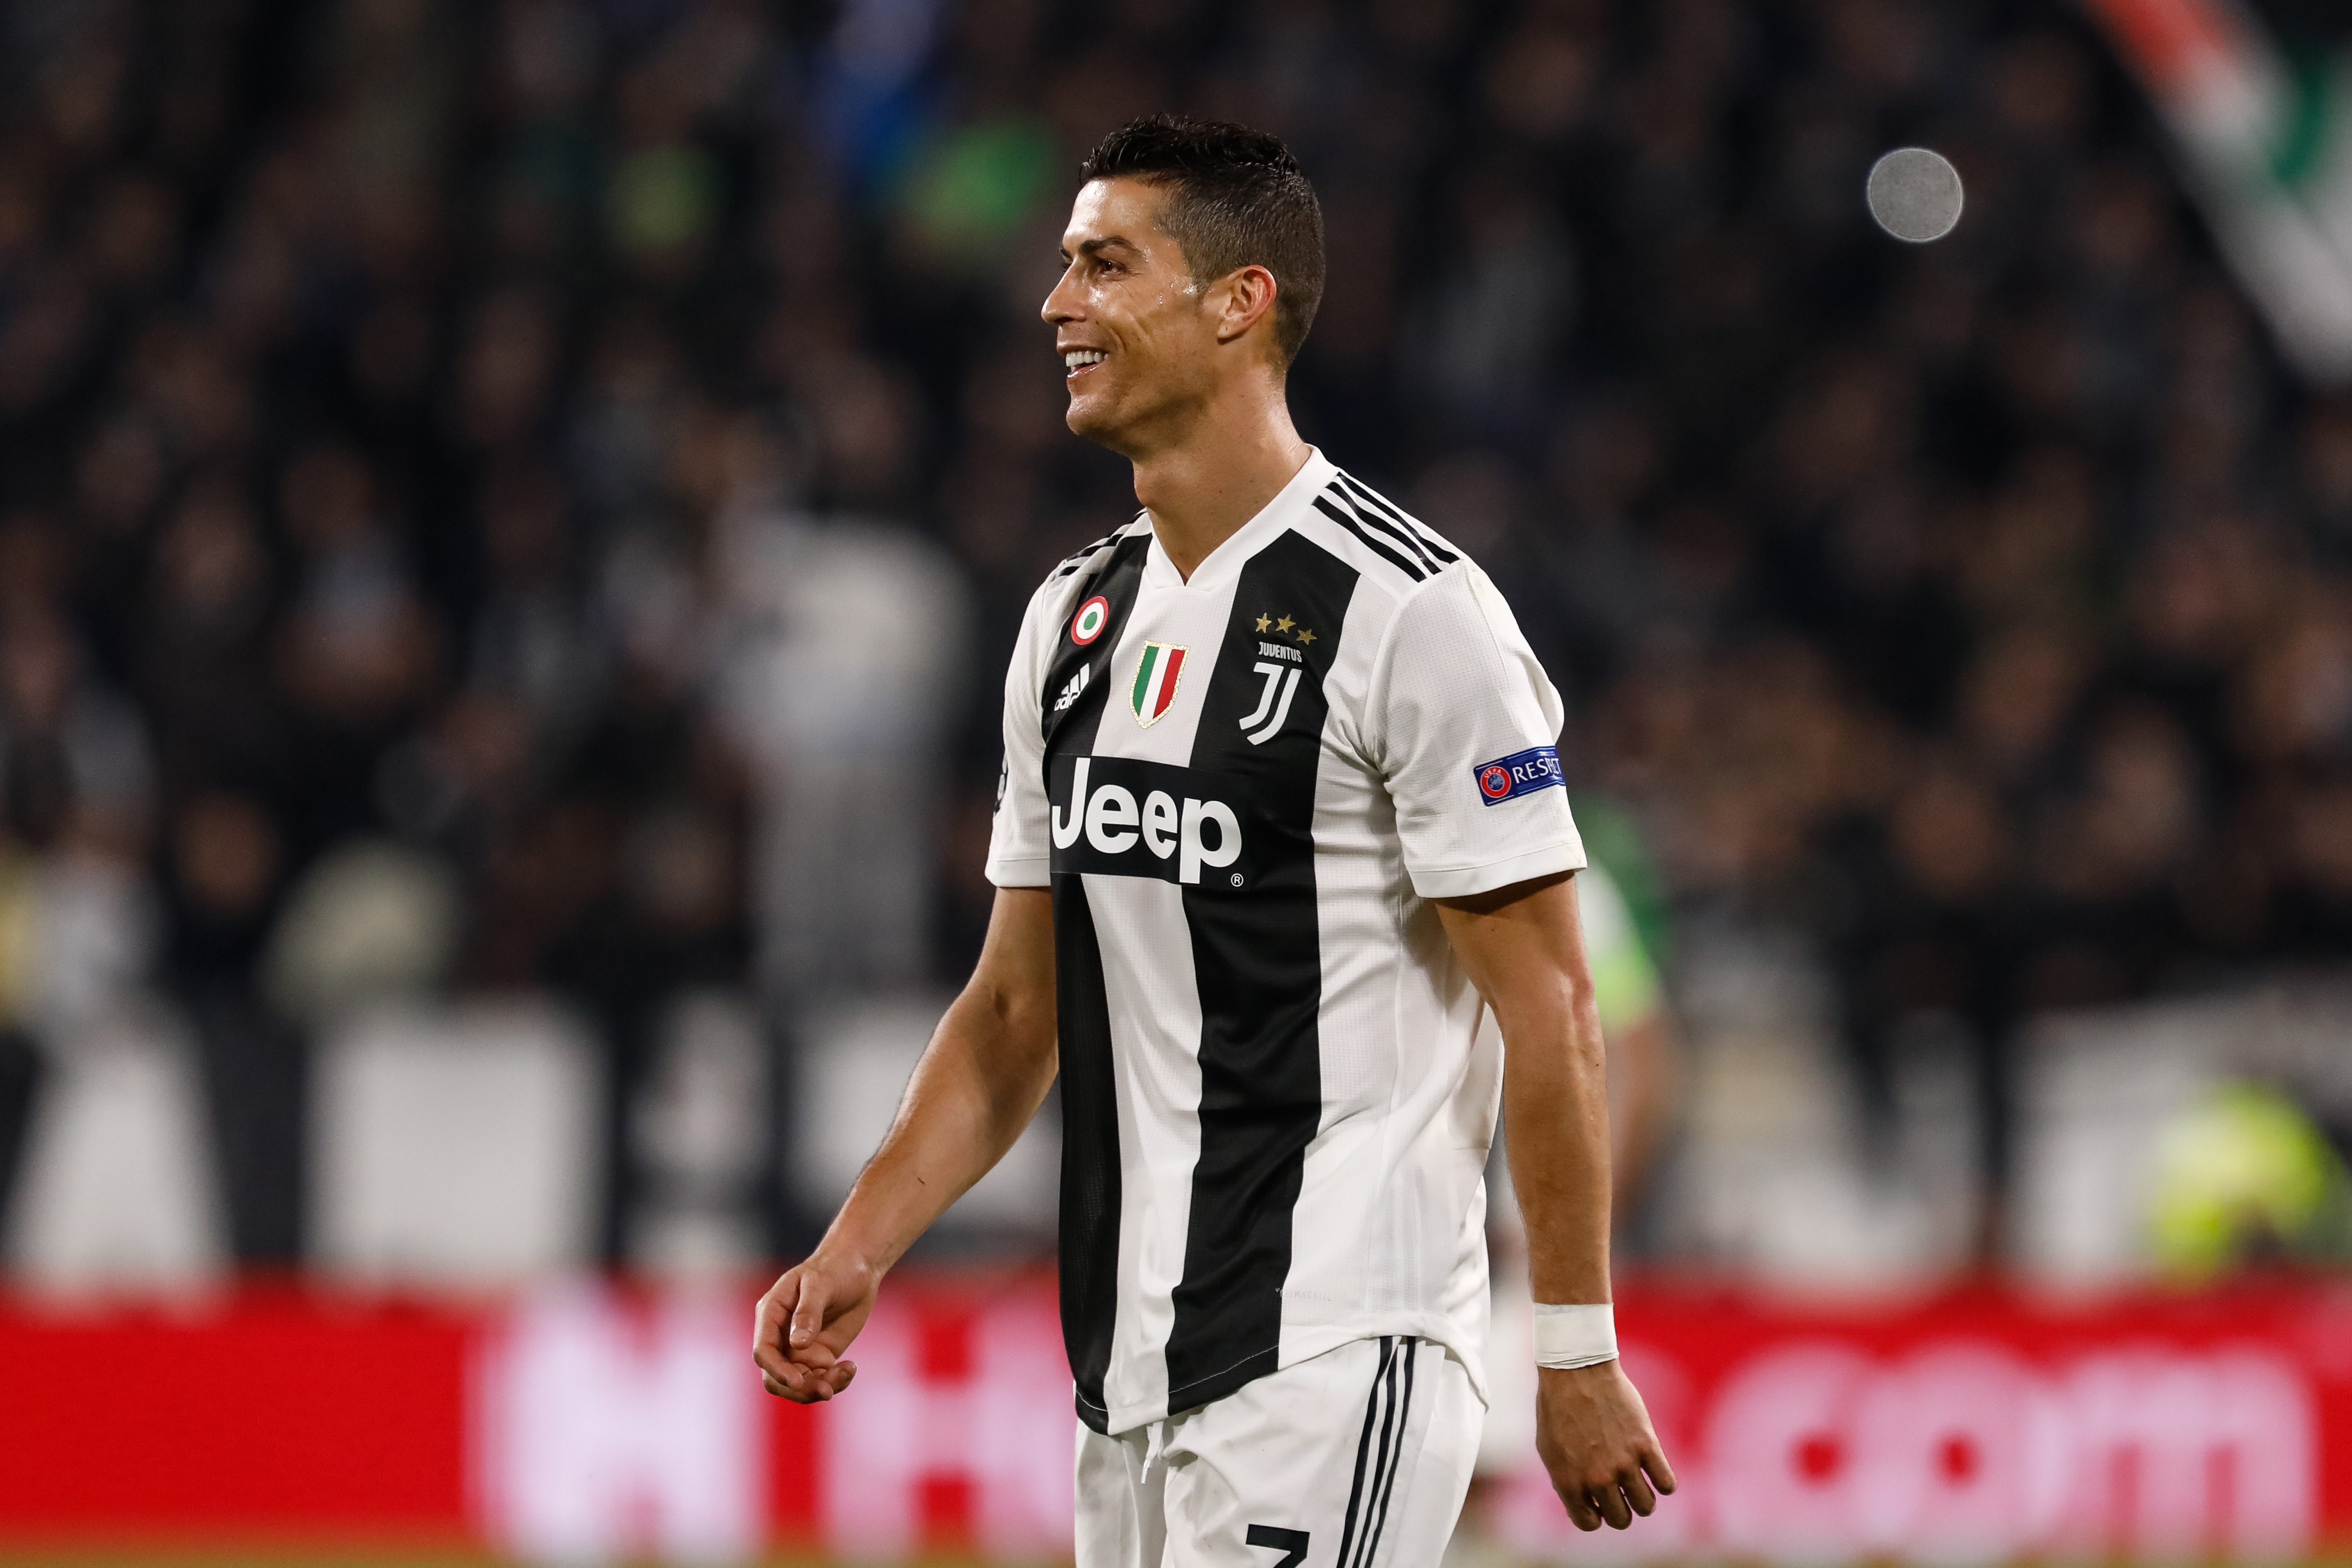 Fiorentina vs. Juventus - Football Match Report